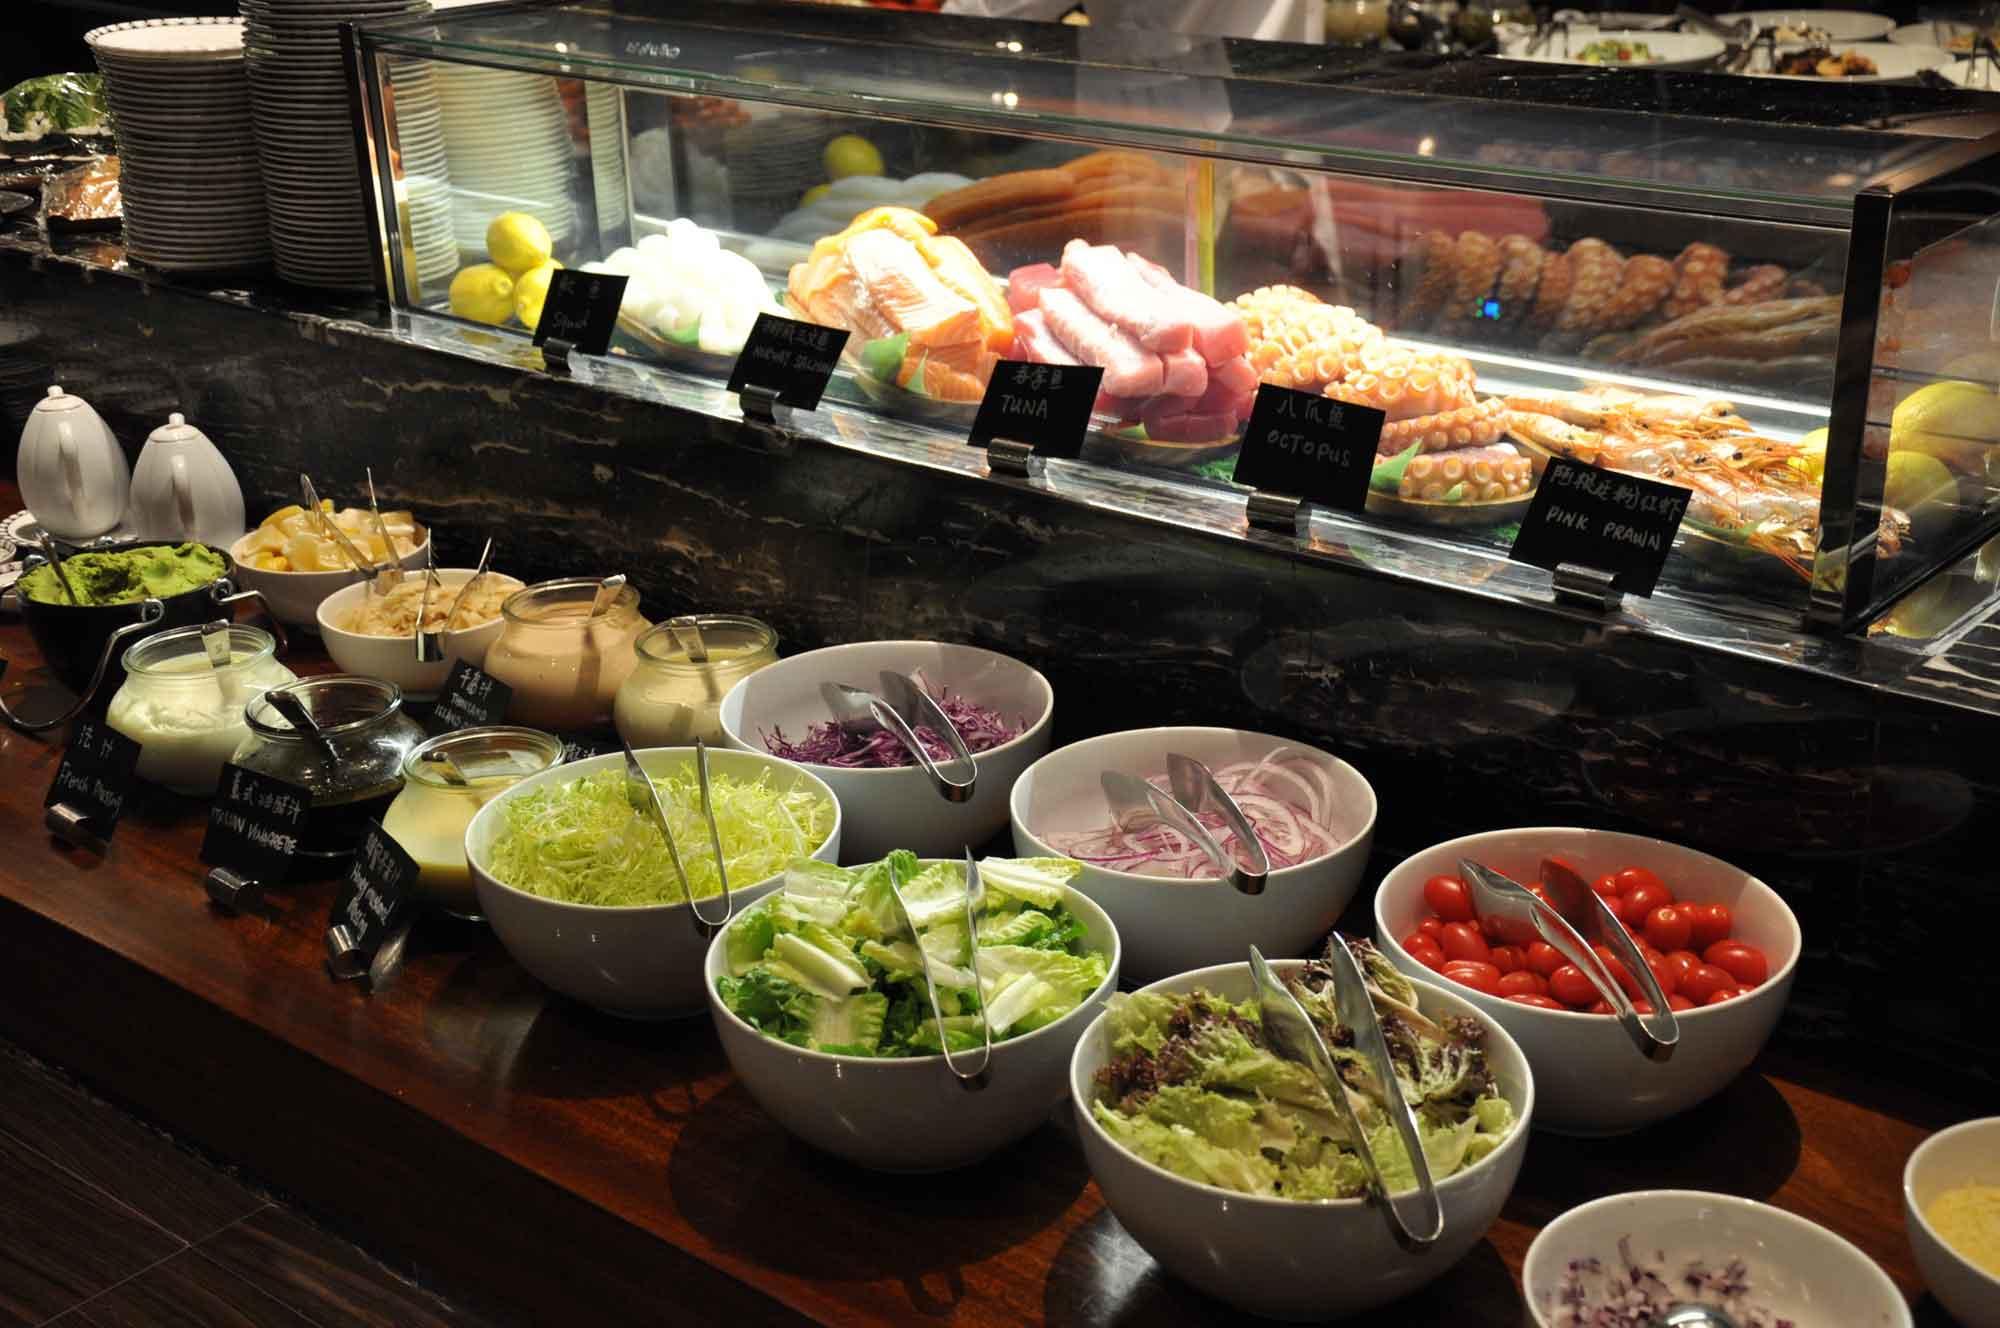 Urban Kitchen Macau salad station